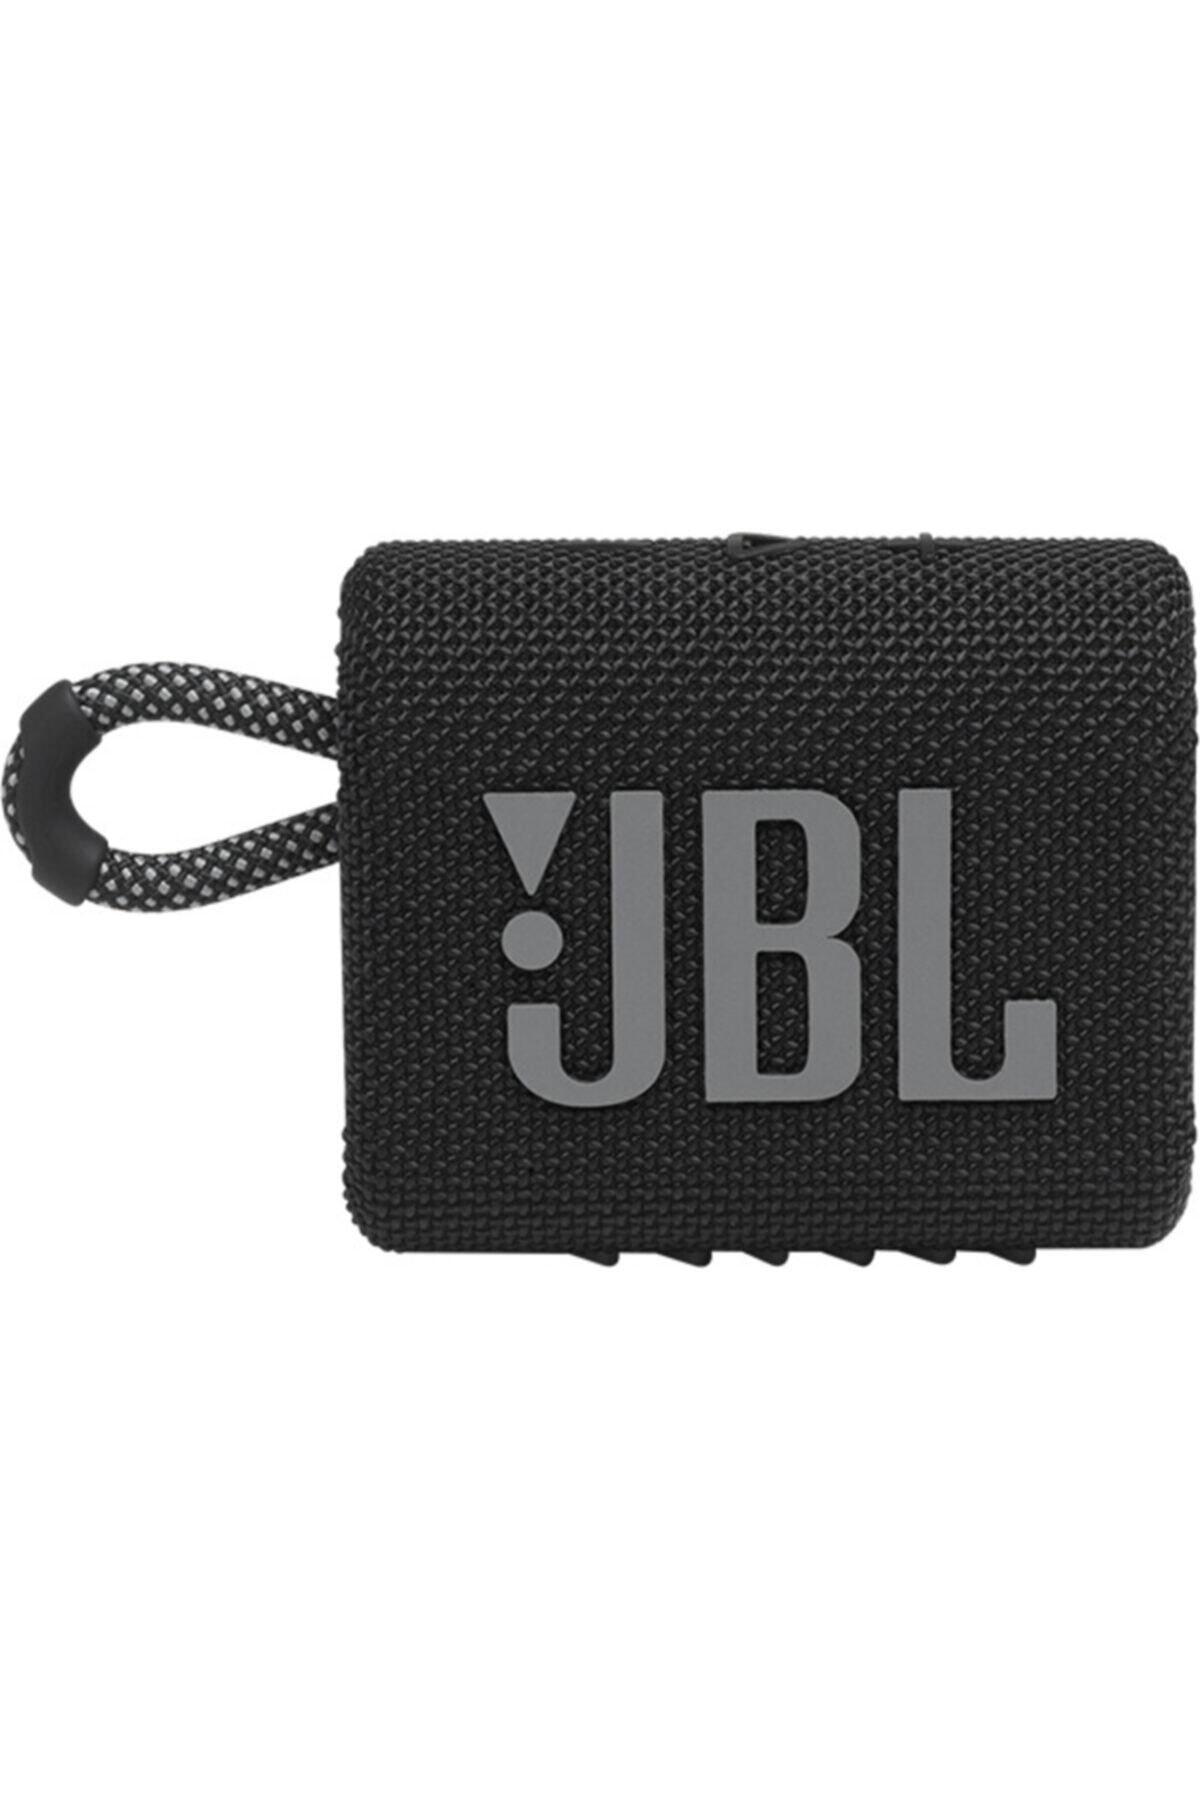 JBL Go 3 Siyah Bluetooth Hoparlör 2